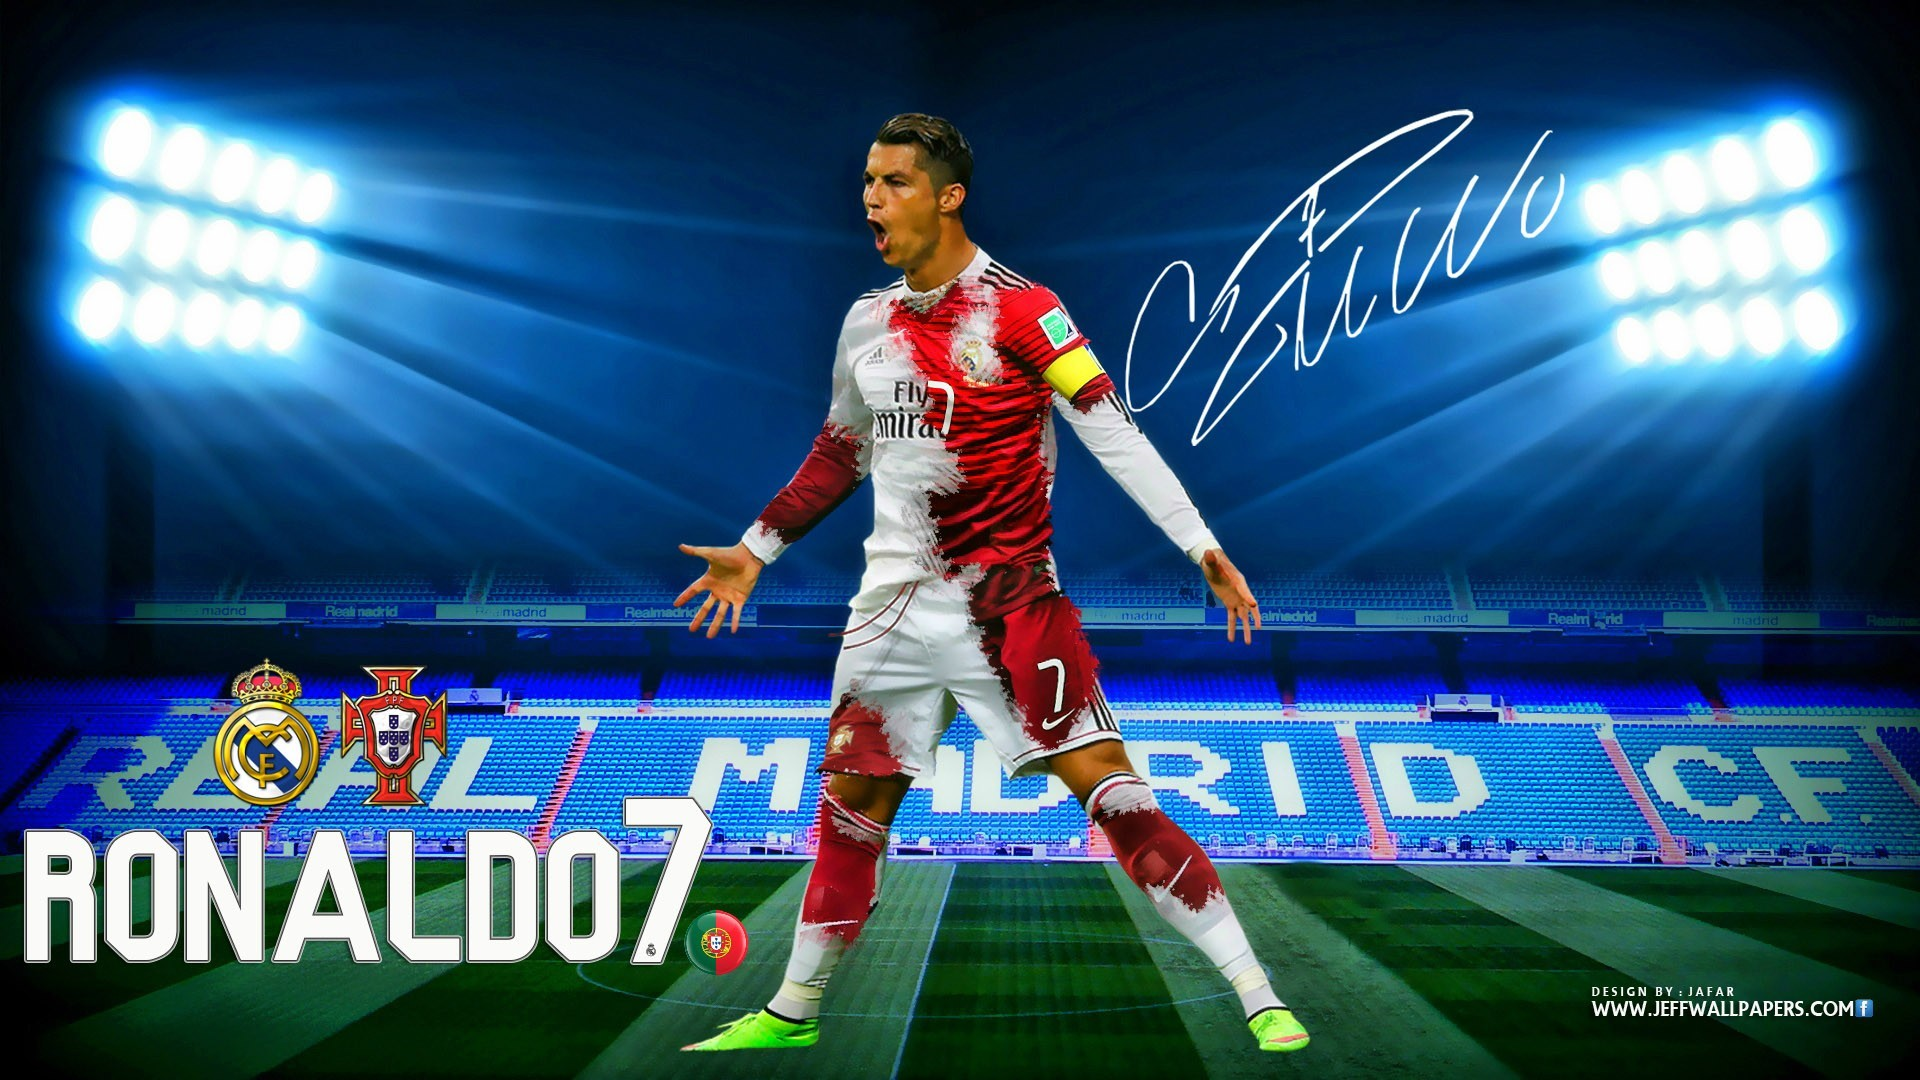 Download Cristiano Ronaldo CR7 Real Madrid Kit 2015 HD Wallpaper .